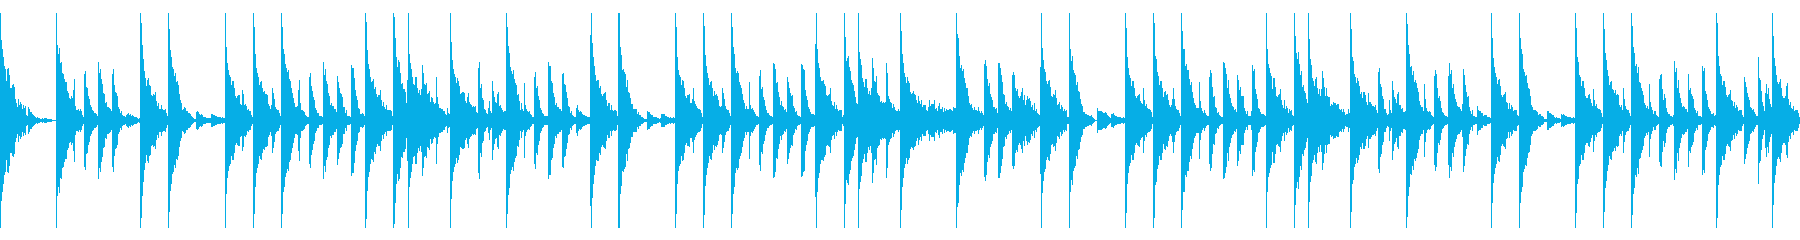 95 BPMの再生済みの波形